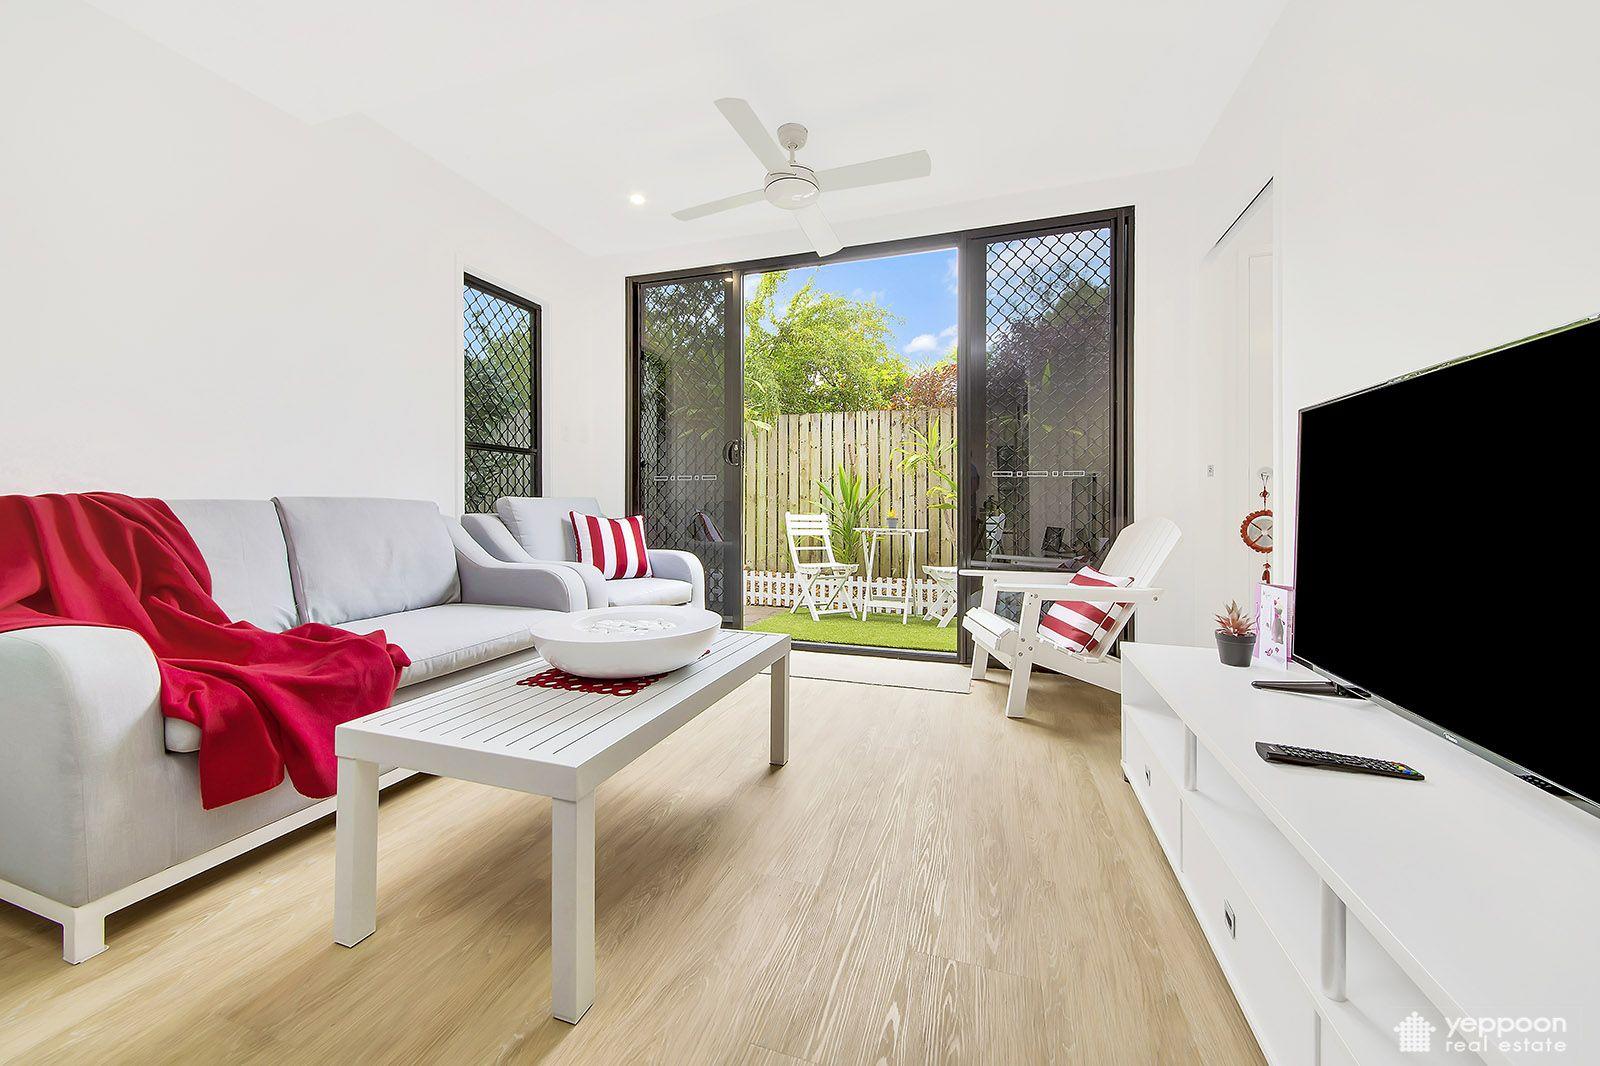 2/41 Adelaide Park Road, Yeppoon QLD 4703, Image 0